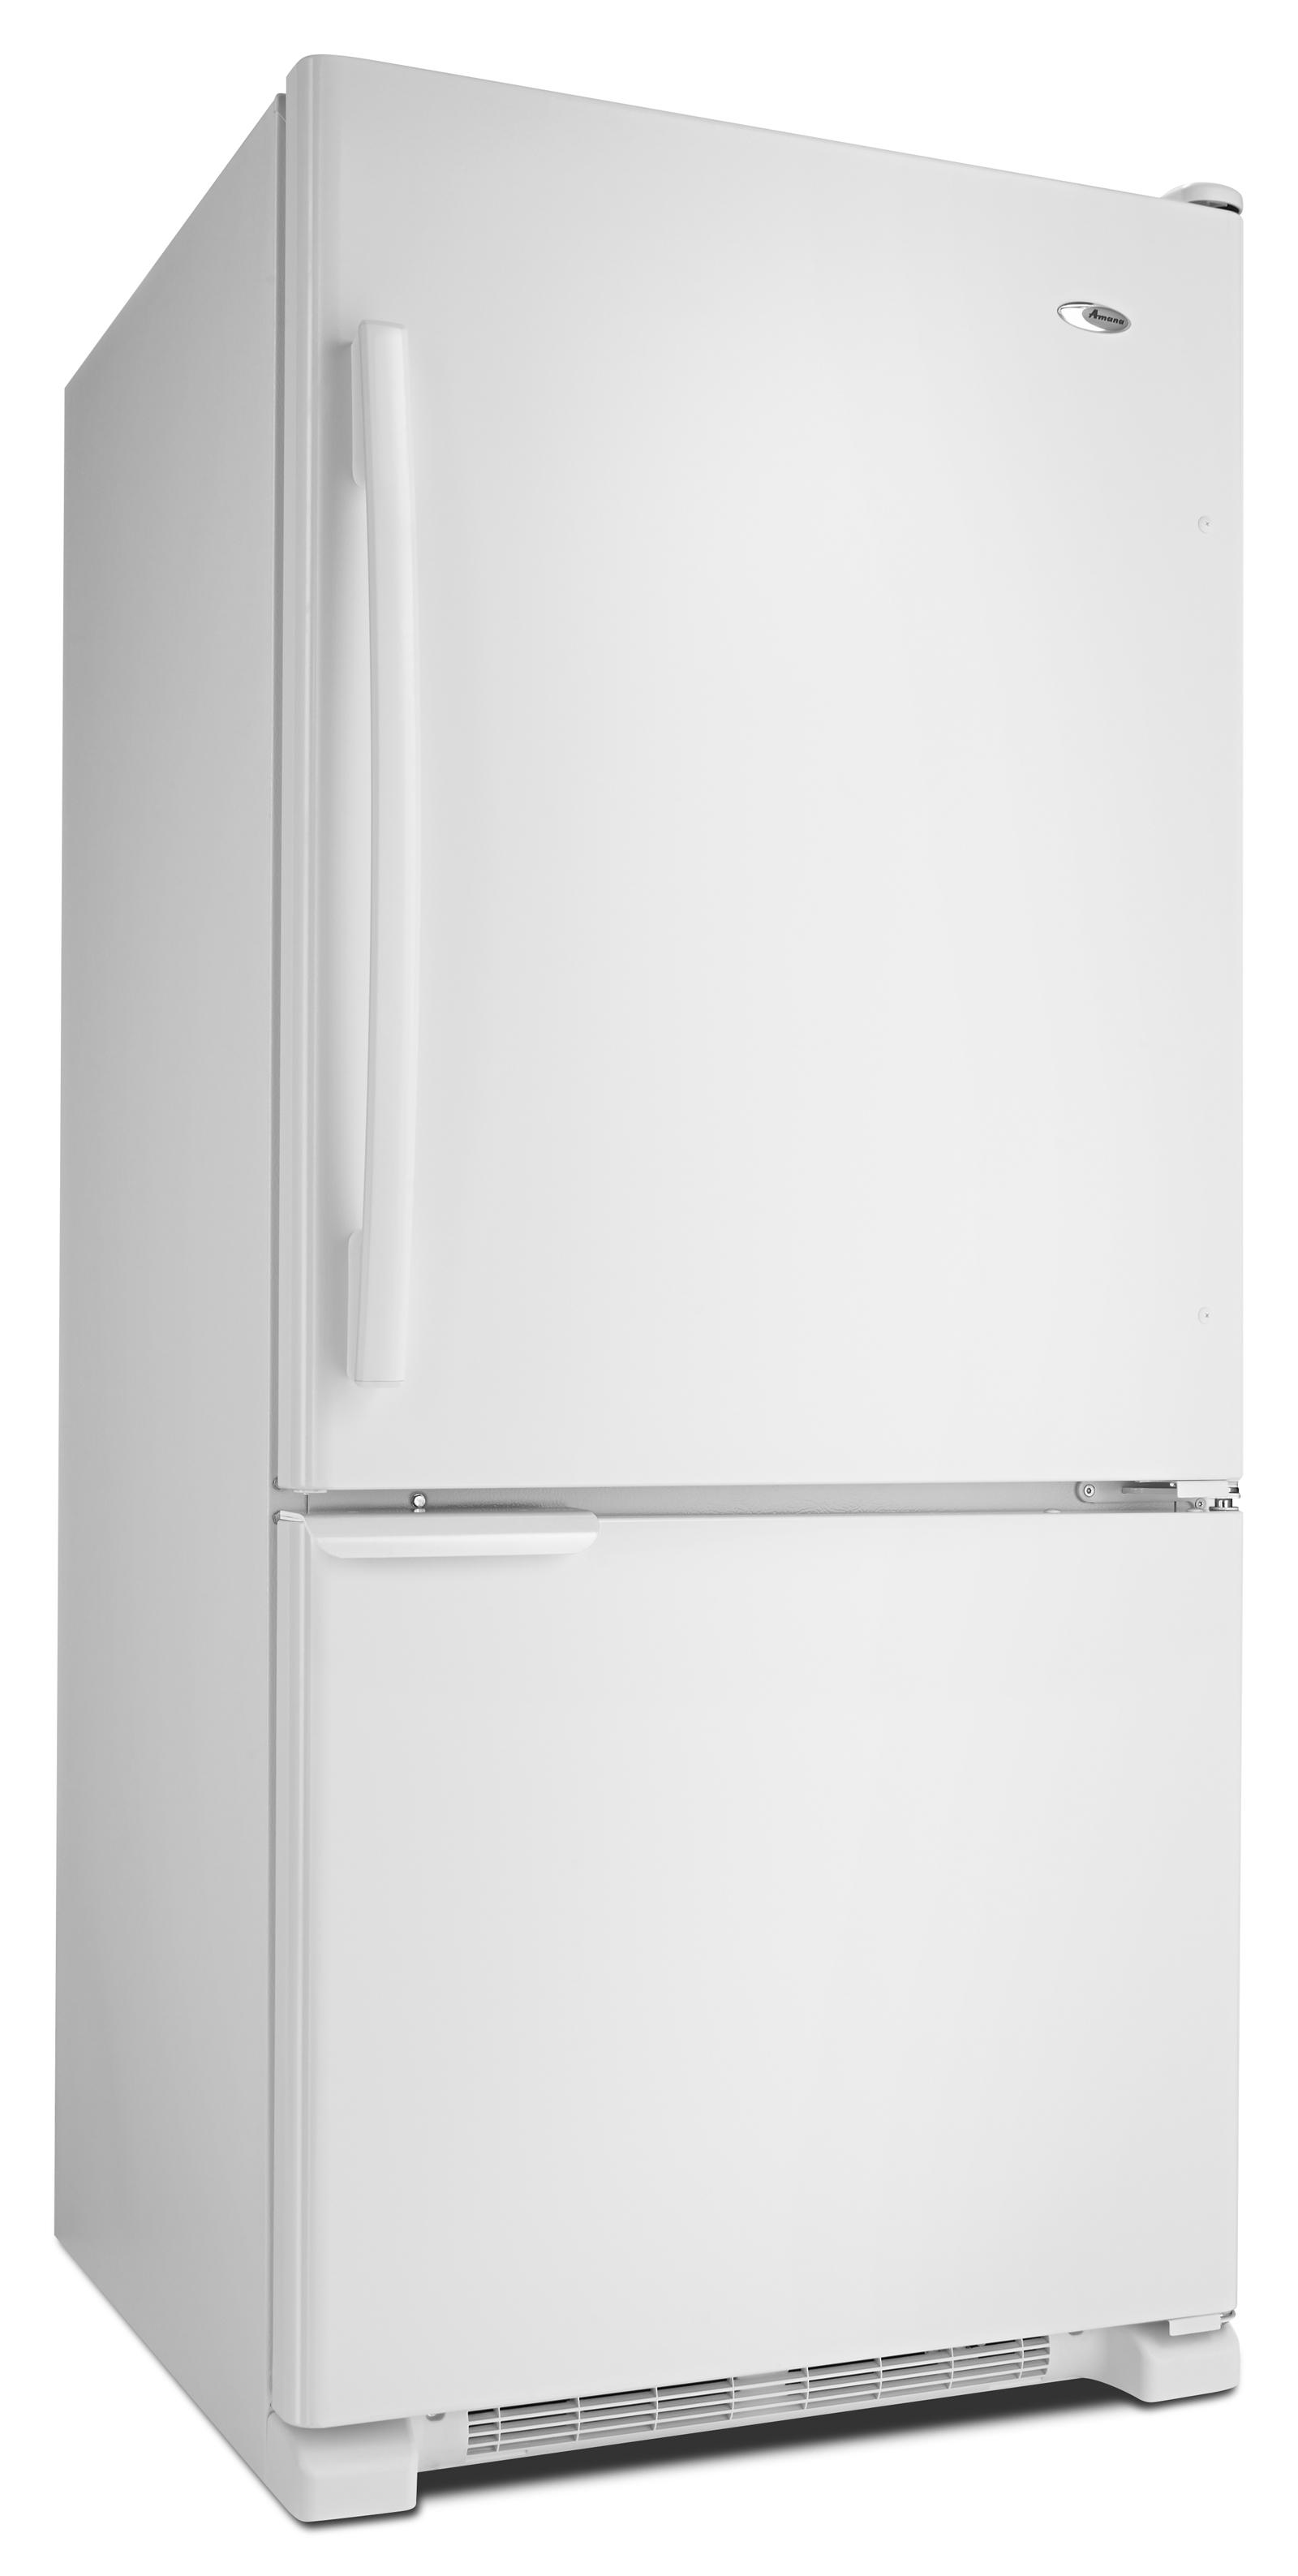 Amana 19 cu. ft. Bottom-Freezer Refrigerator with Garden Fresh™ Crisper Bins